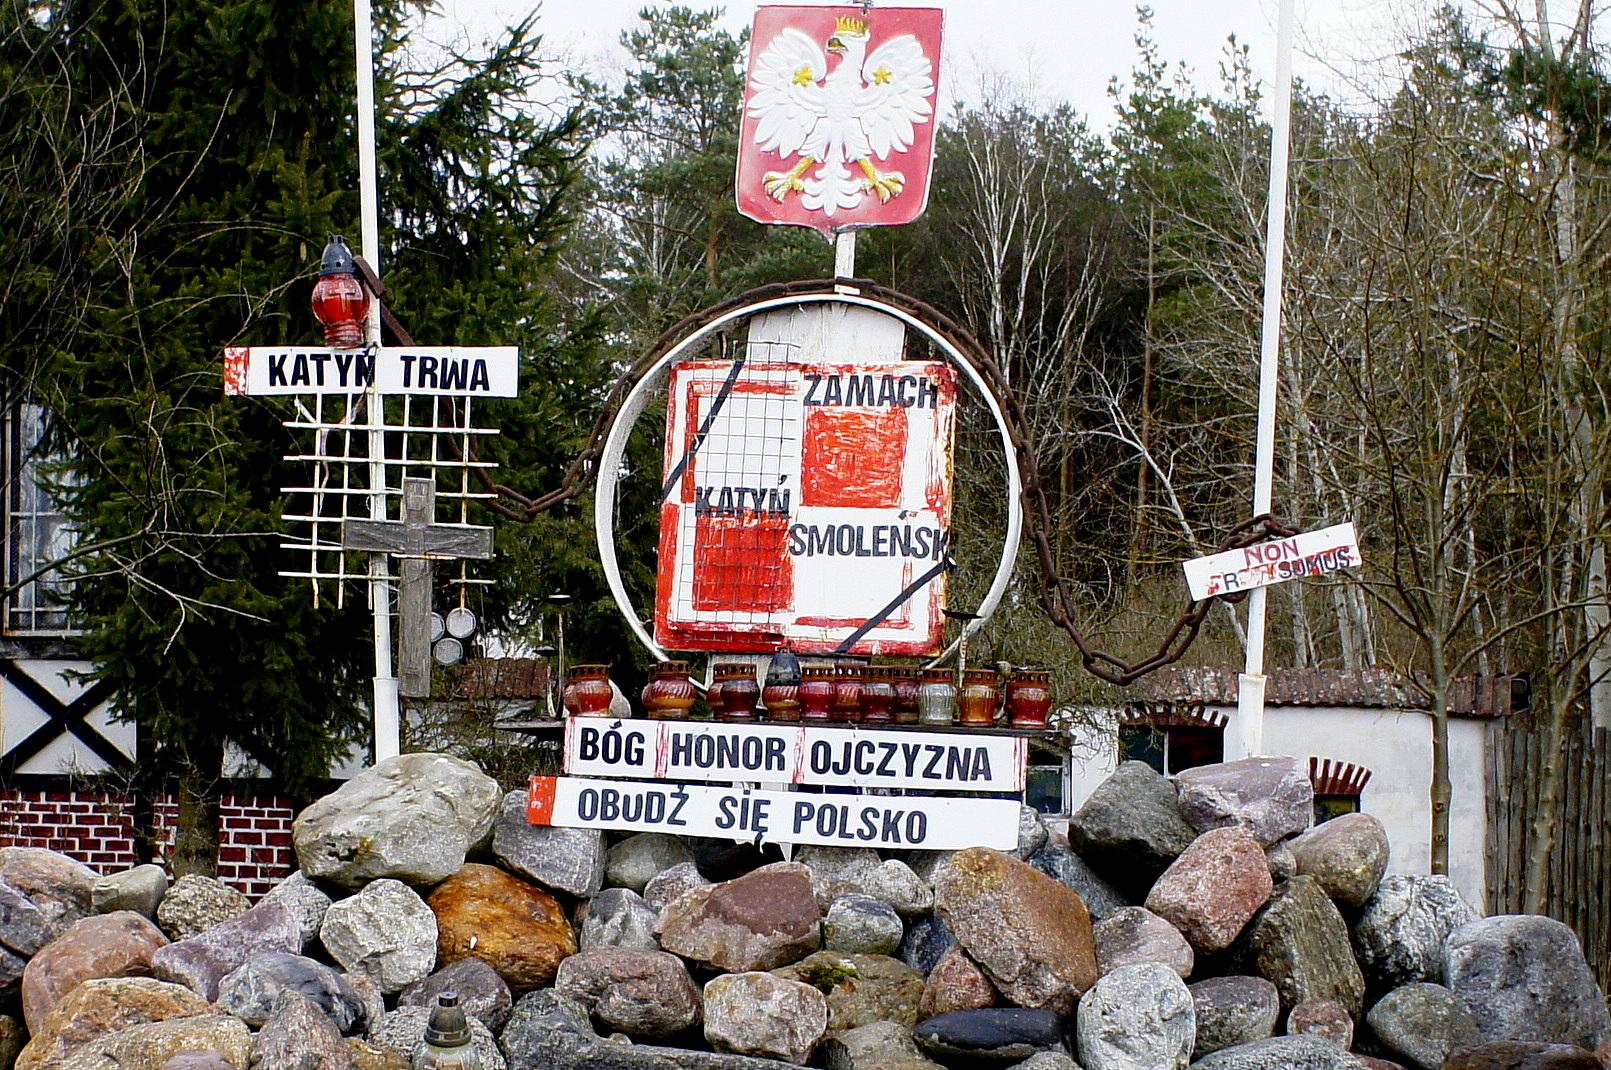 File:Dobrojewo (katastrofa smoleńska 1) jpg - Wikimedia Commons